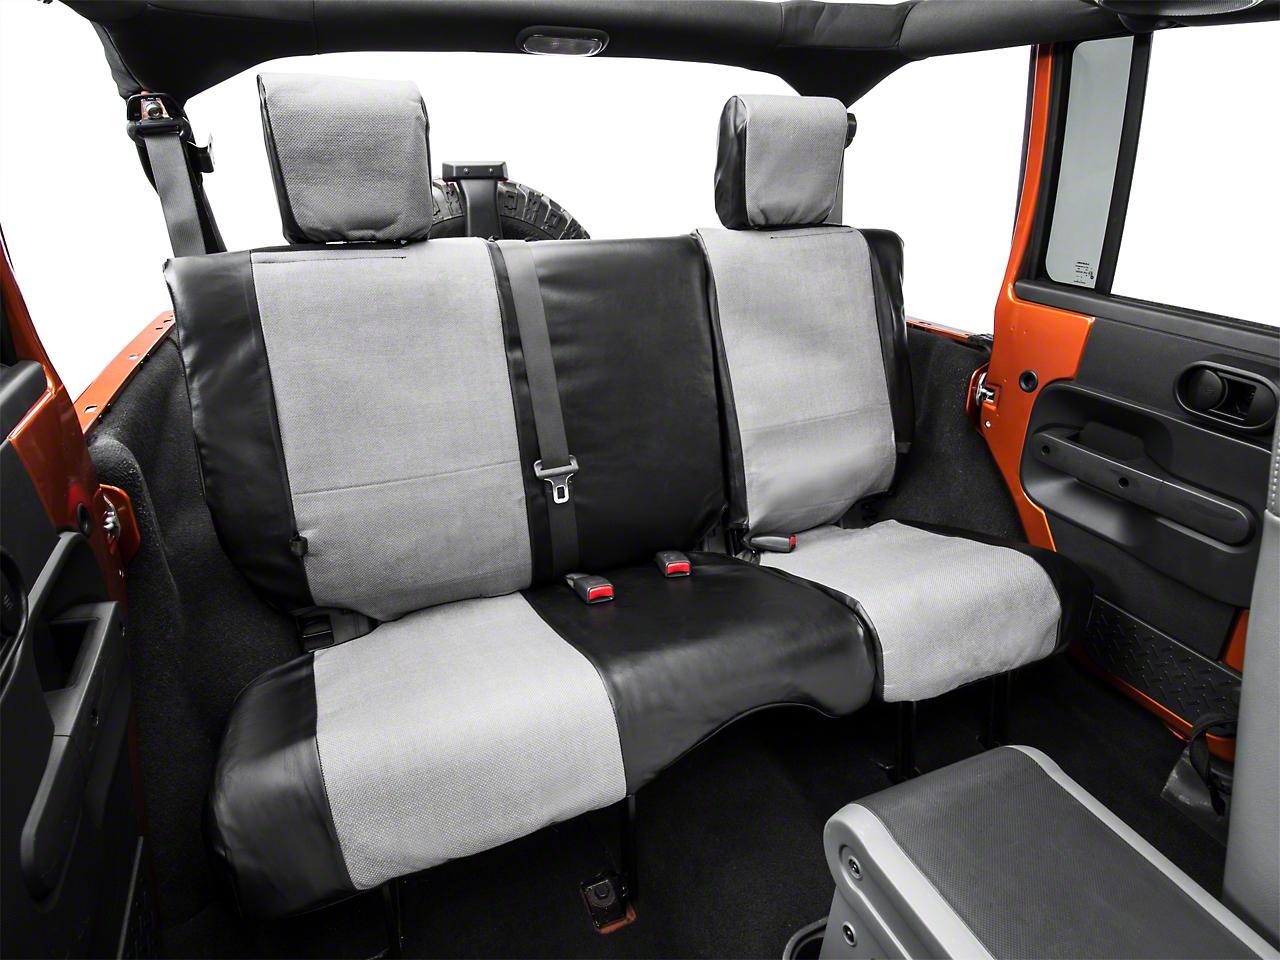 Smittybilt XRC Rear Seat Cover - Black/Gray (08-18 Jeep Wrangler JK 4 Door)